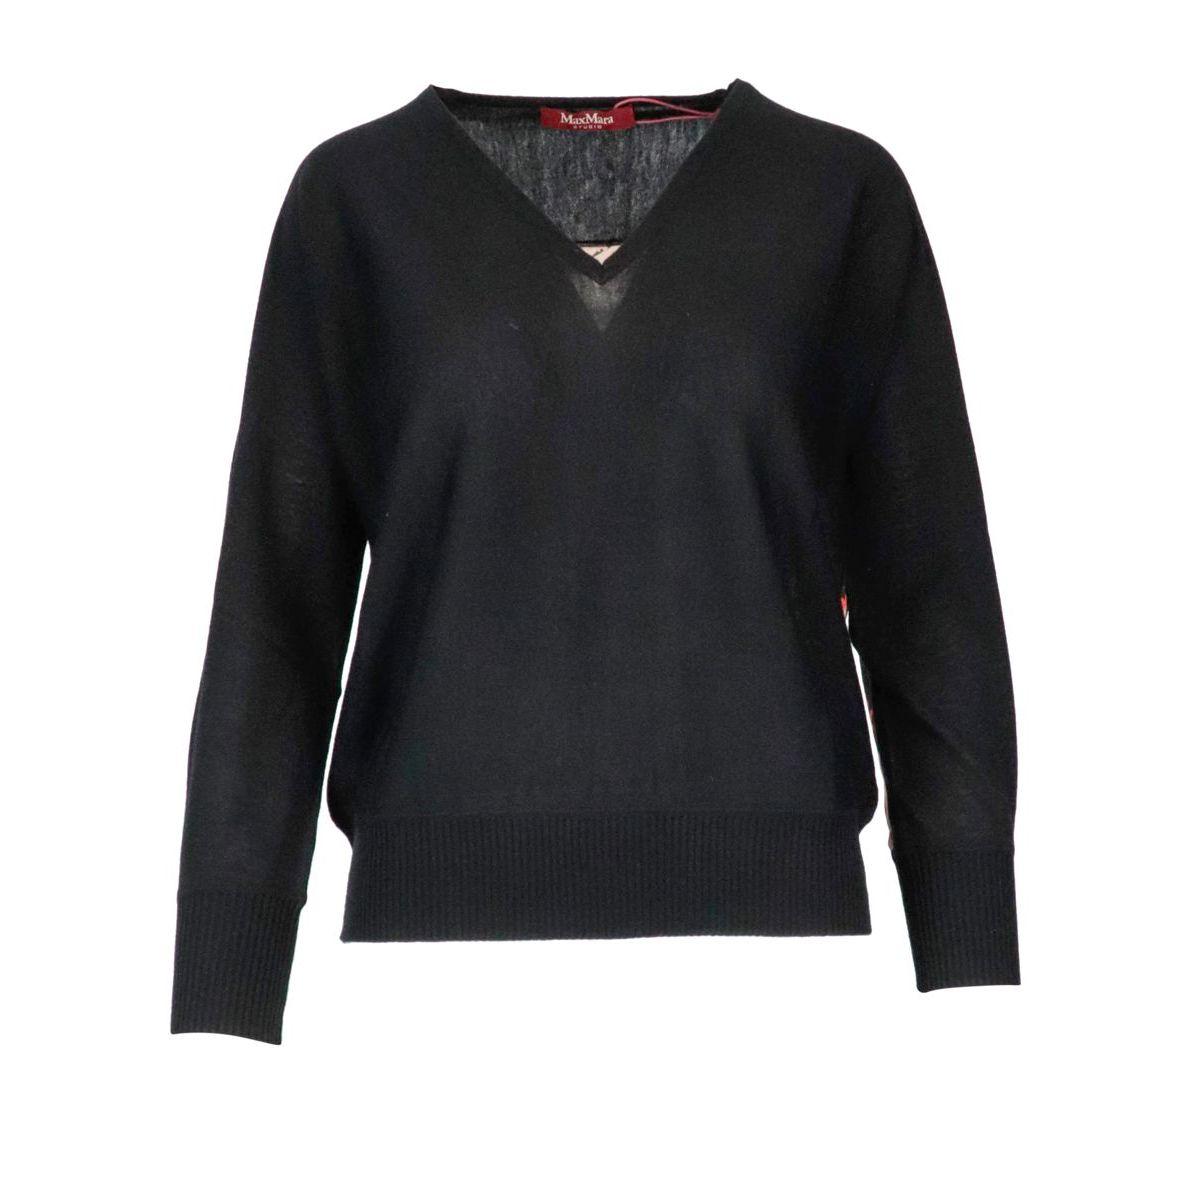 Coimbra wool and silk sweater Black MAX MARA STUDIO